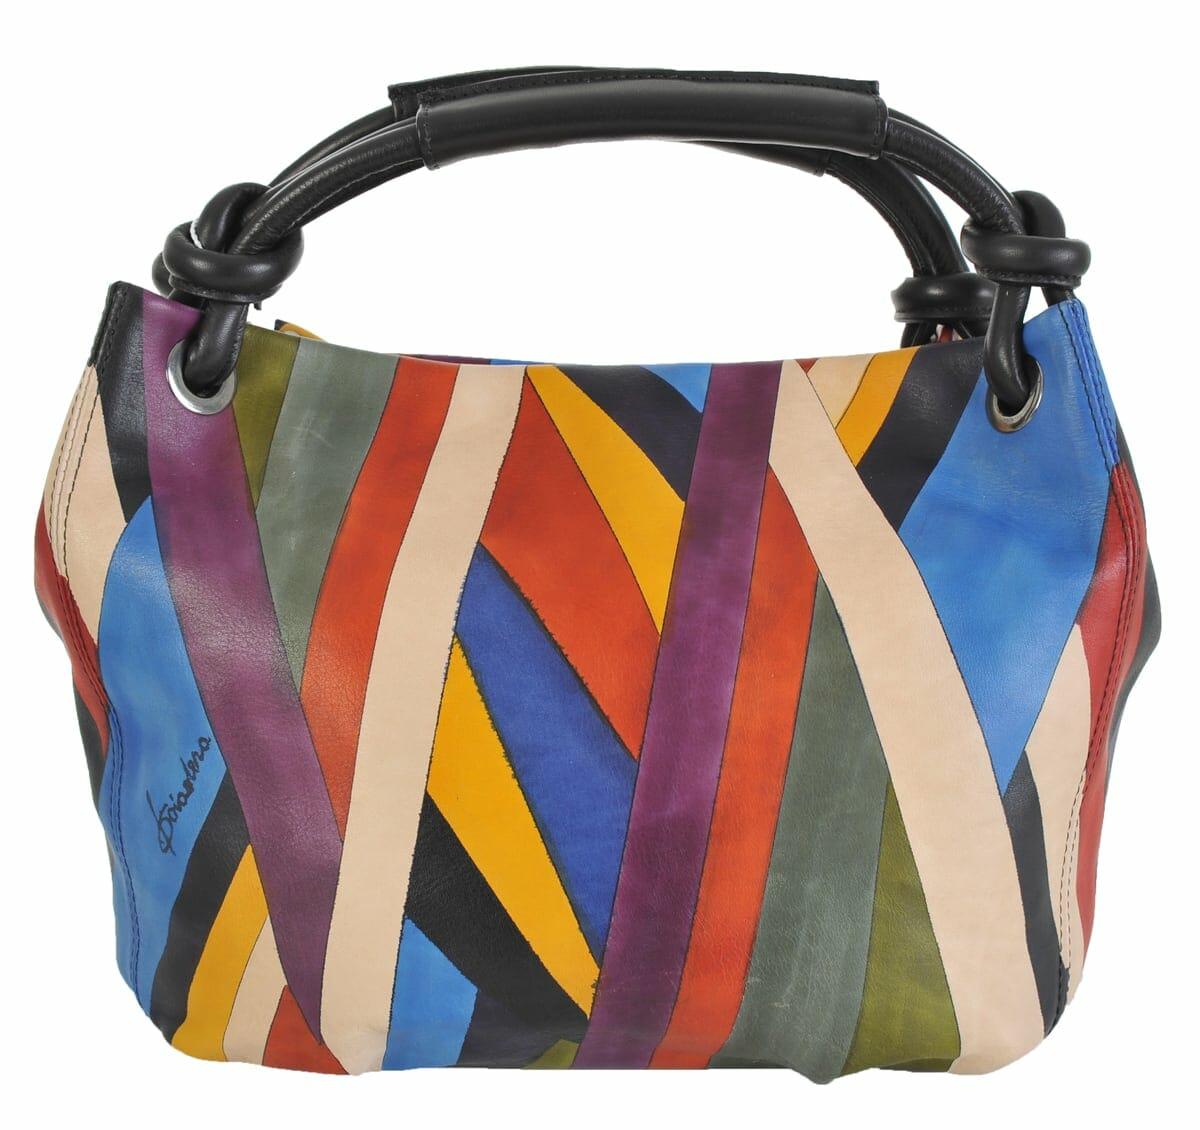 82798f497bdf baiadera Archives - David Viggers Ltd - Classic and Fashion Accessories